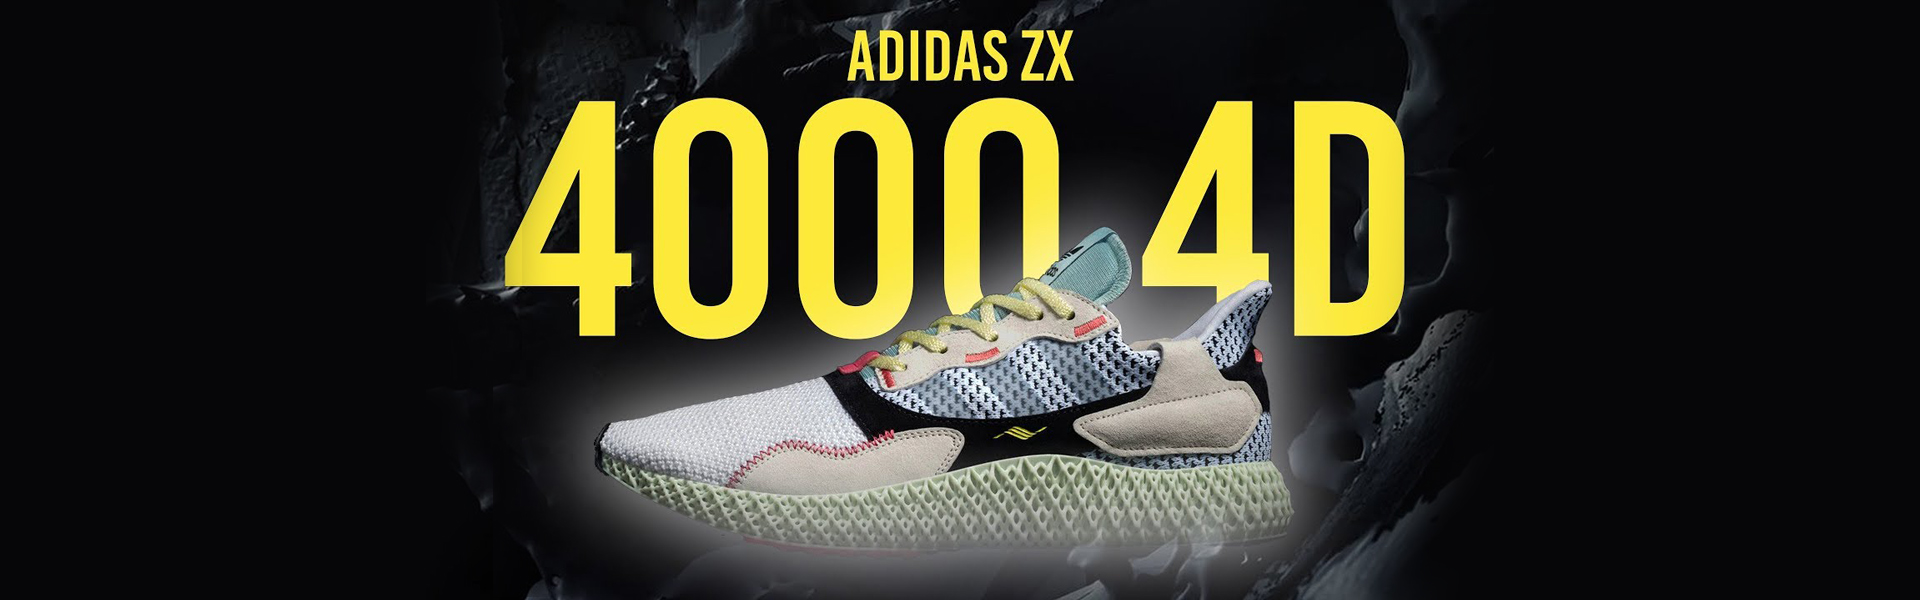 zx-4000